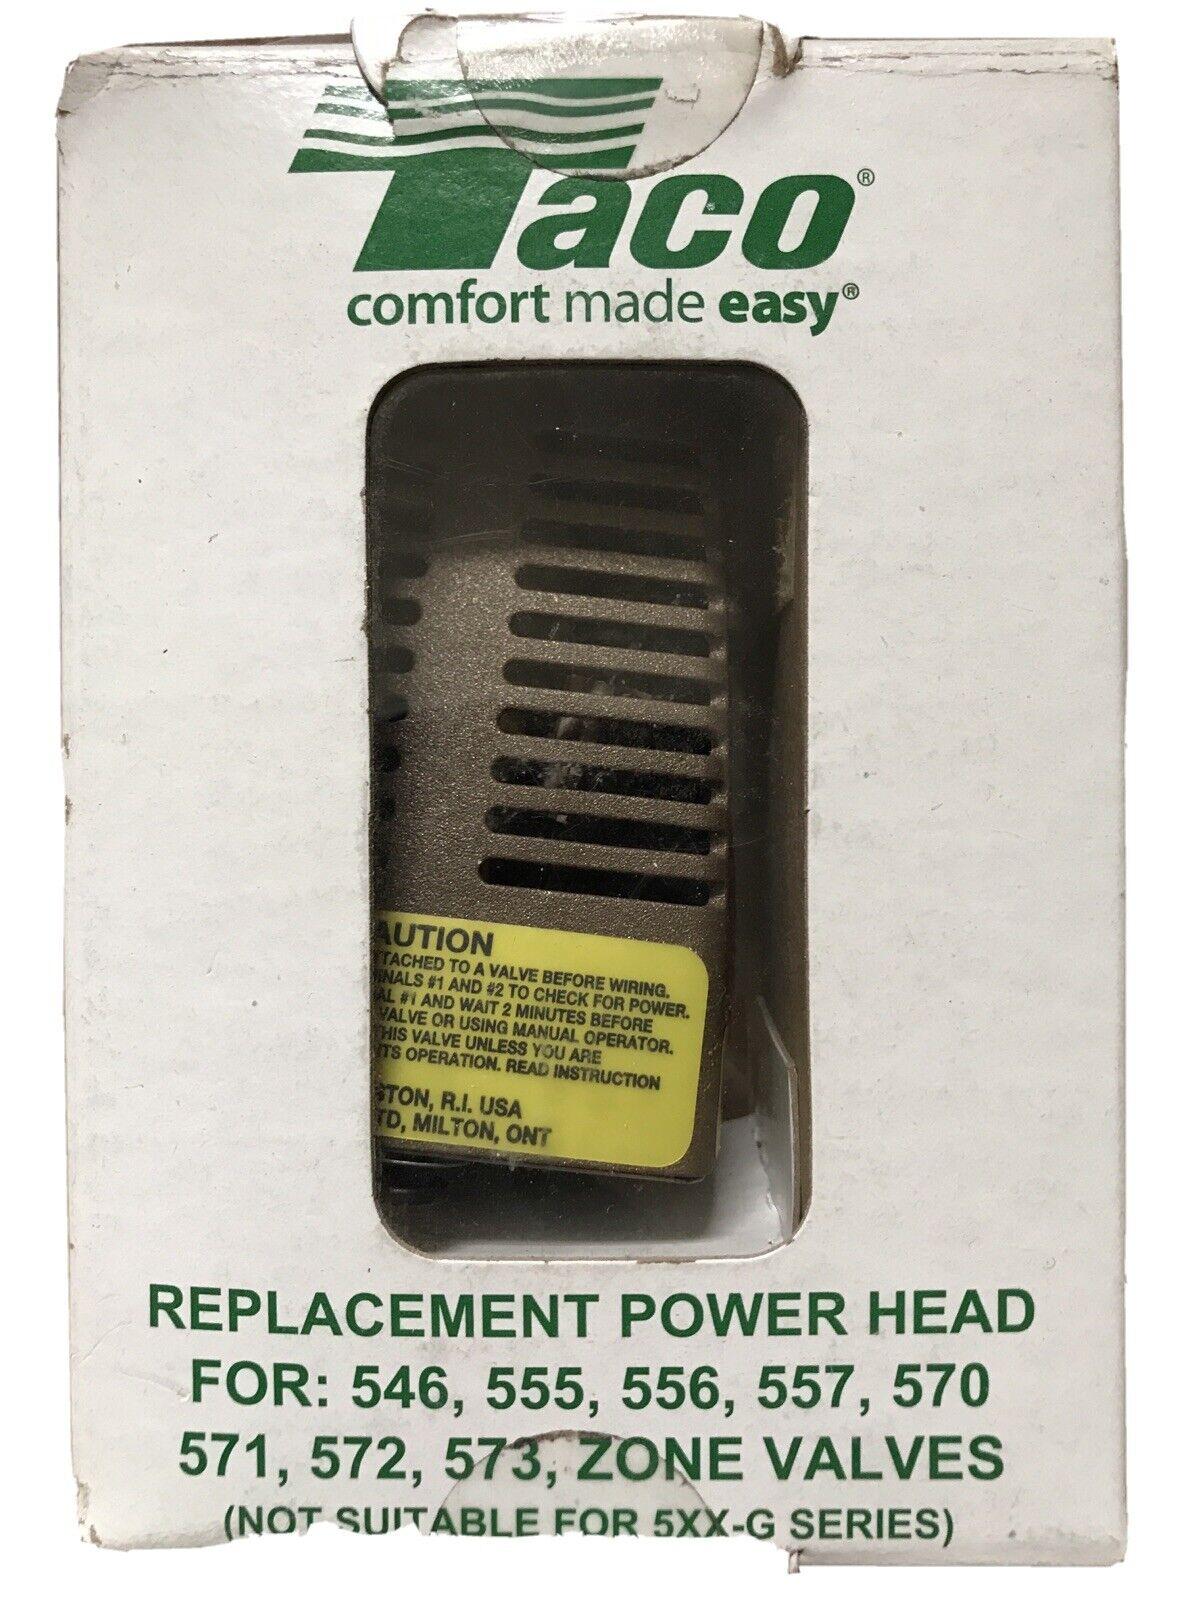 Taco Replacement Zone Valve Power Head 24V 545,555,556,557,570 60 Days Return